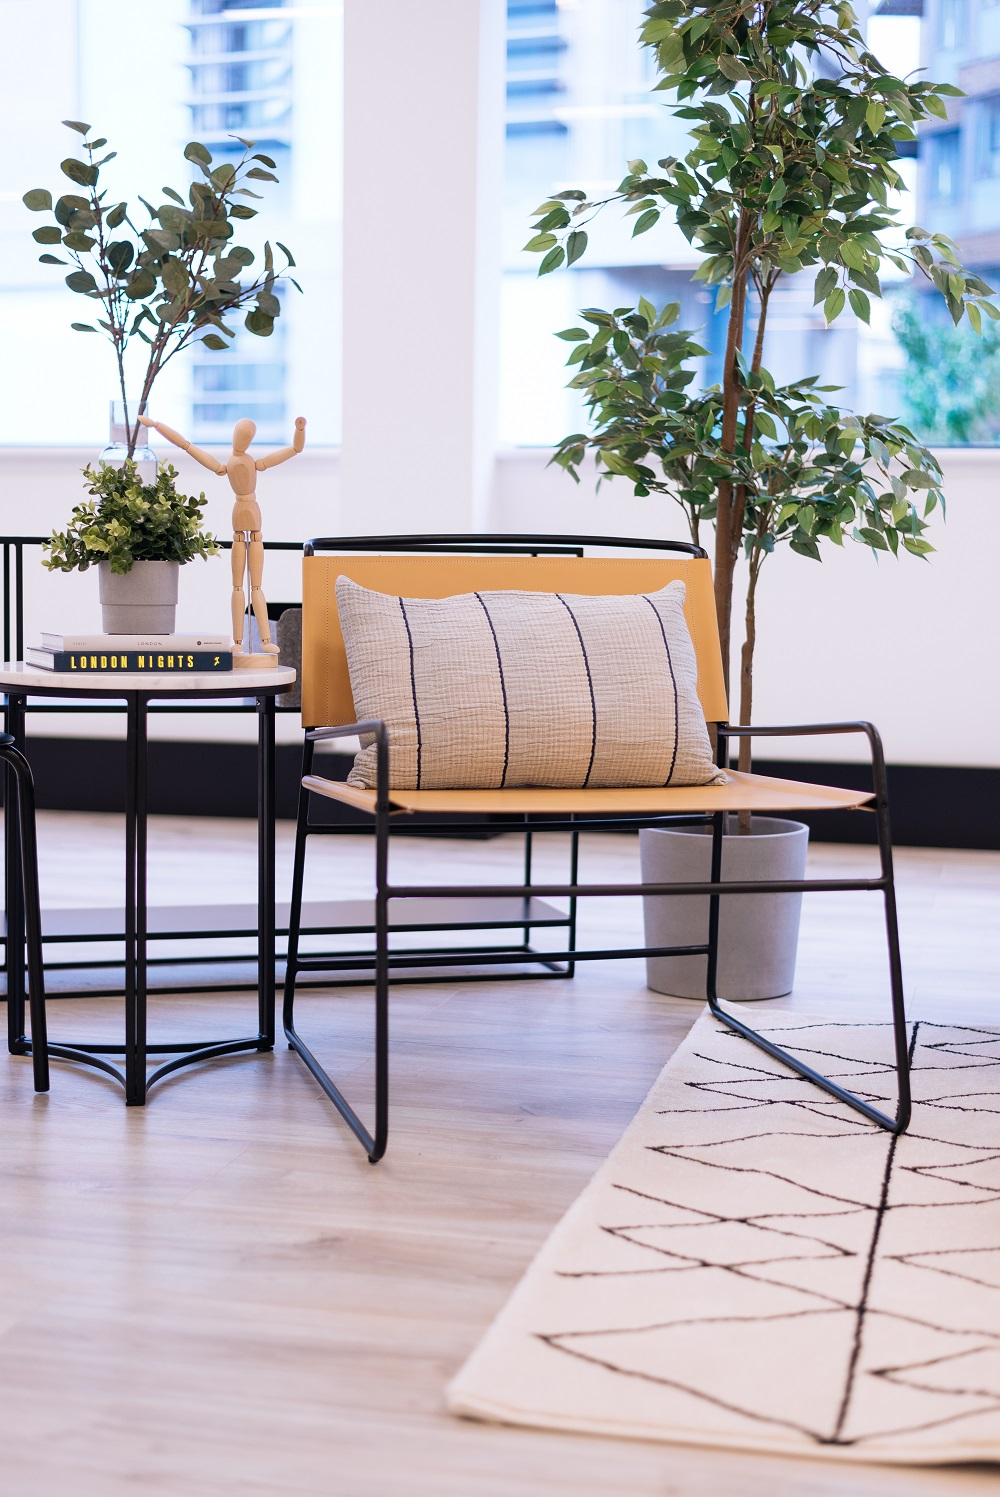 Office Chair by Irina